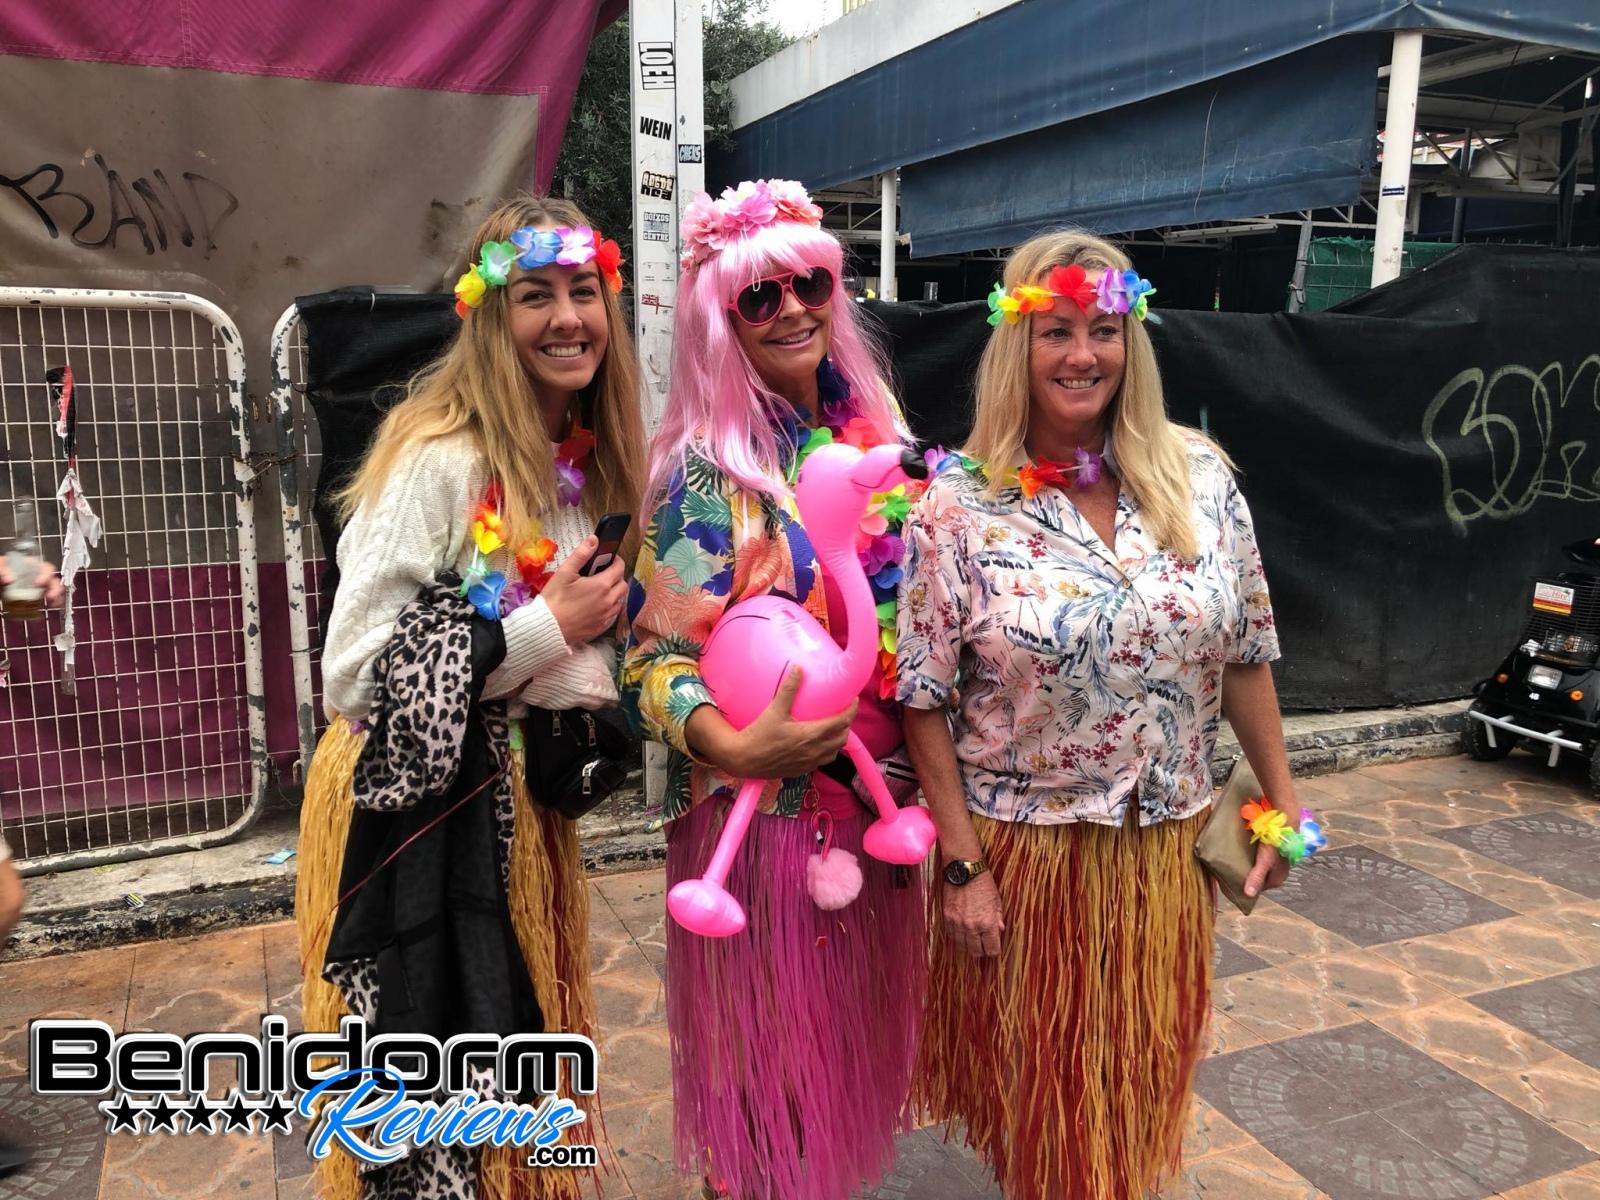 Benidorm-Fiestas-2019-Fancy-Dress-89